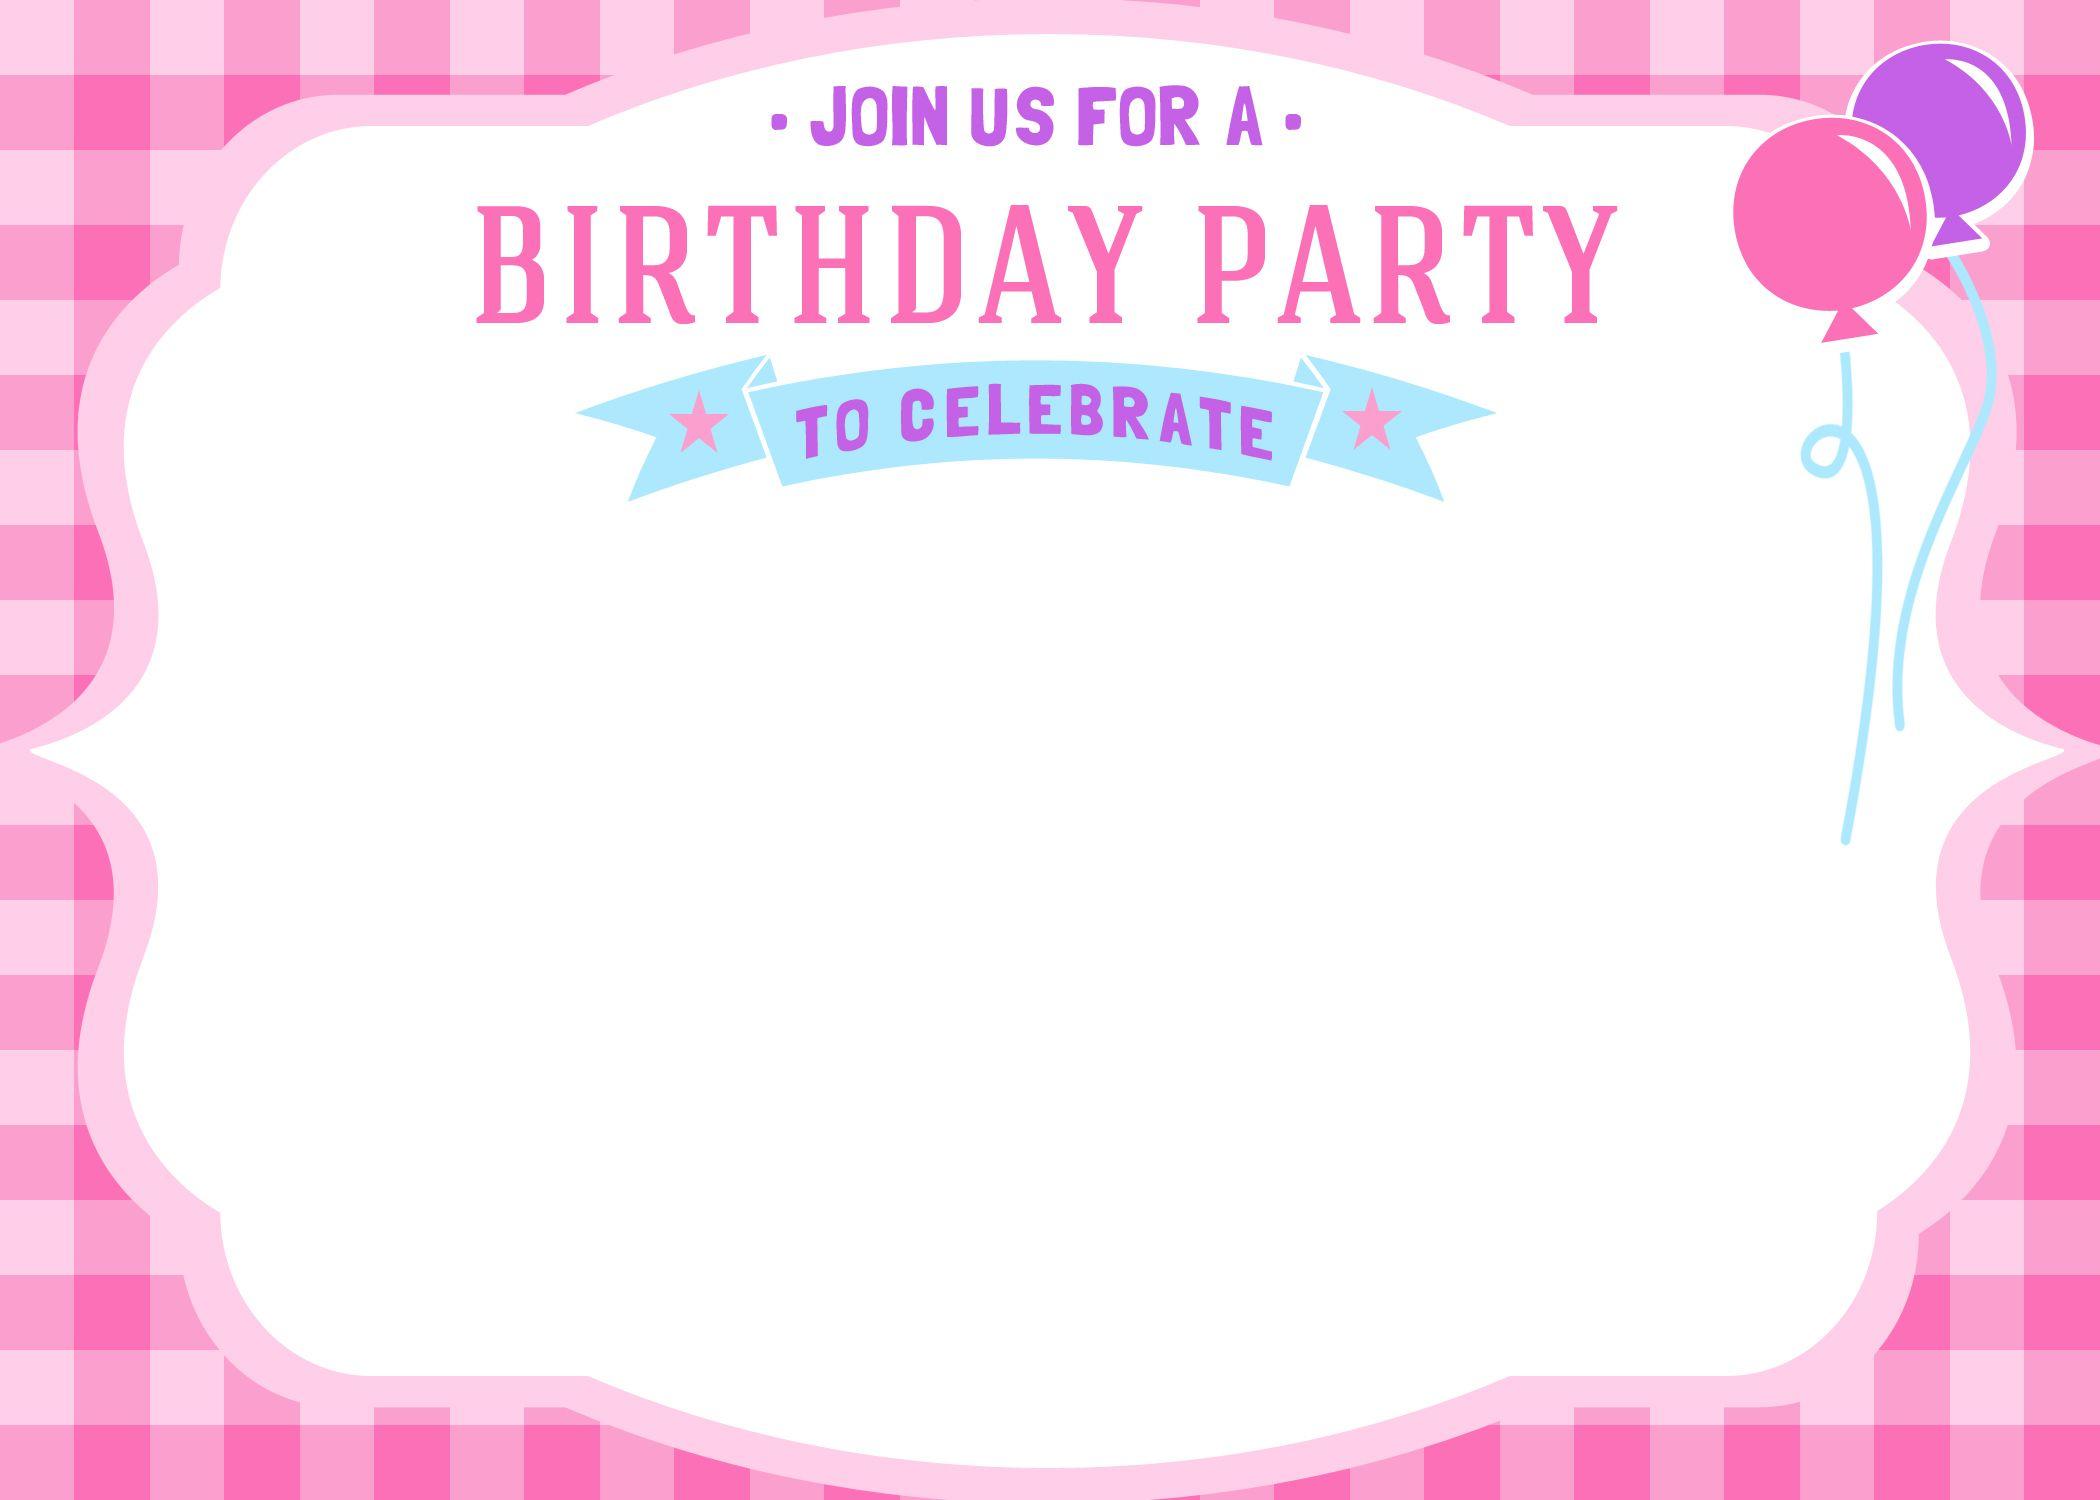 Email Birthday Invitations festive season card wedding invitation ...